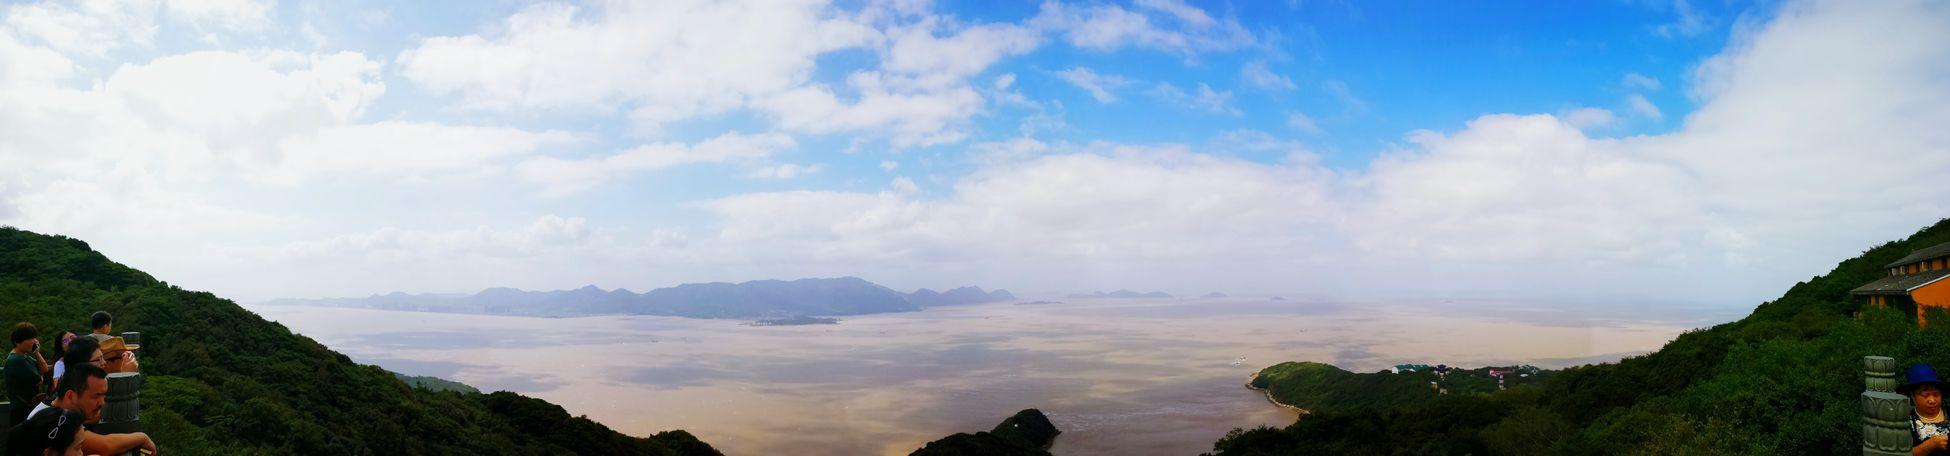 登高佛顶山 一览众岛小。 Outdoors Mountain Blue Sky Sky And Sea 普陀山 Travel Nature